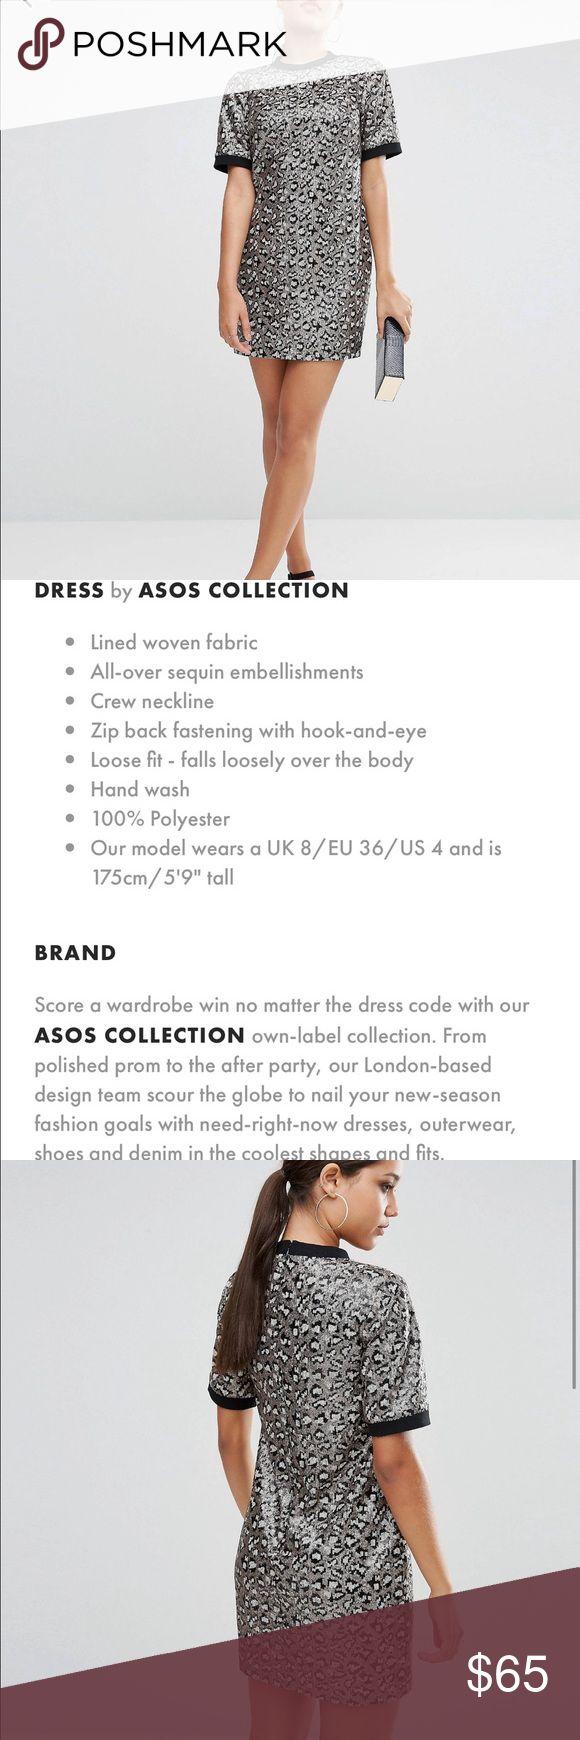 ASOS animal print sequin dress ❤ Worn 1x.  Great party dress.  Animal print sequin material. Make an offer!!! ASOS Dresses Mini